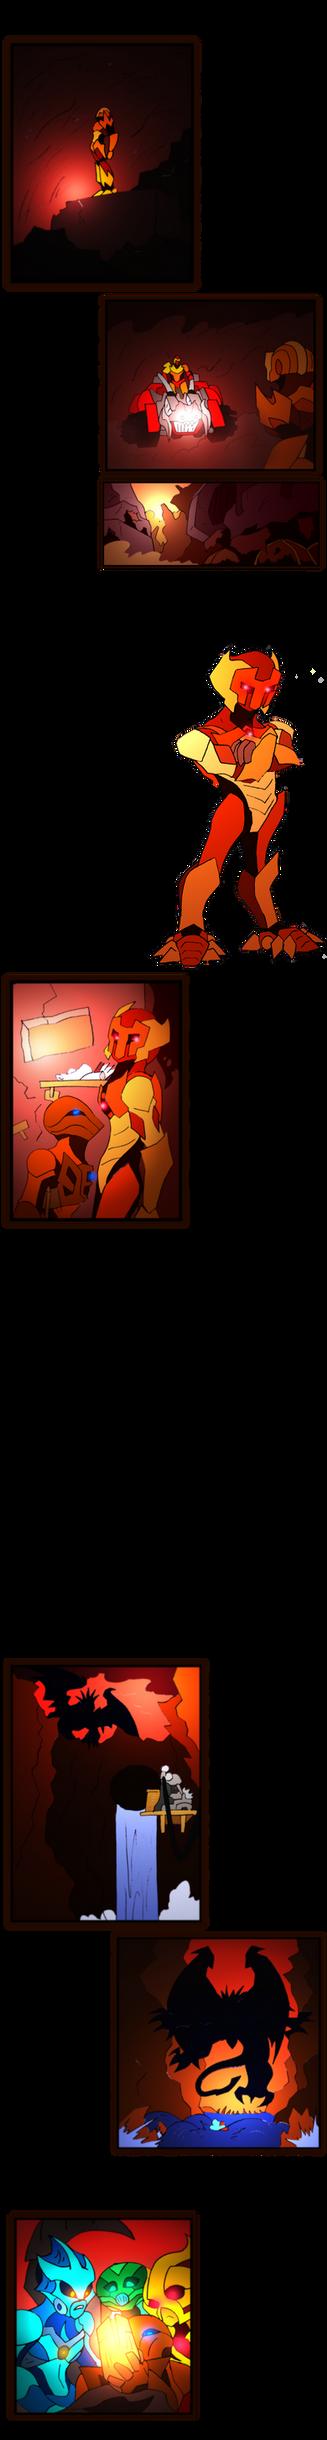 Bionicle- Nova Orbis- Mystery- Chapter 9